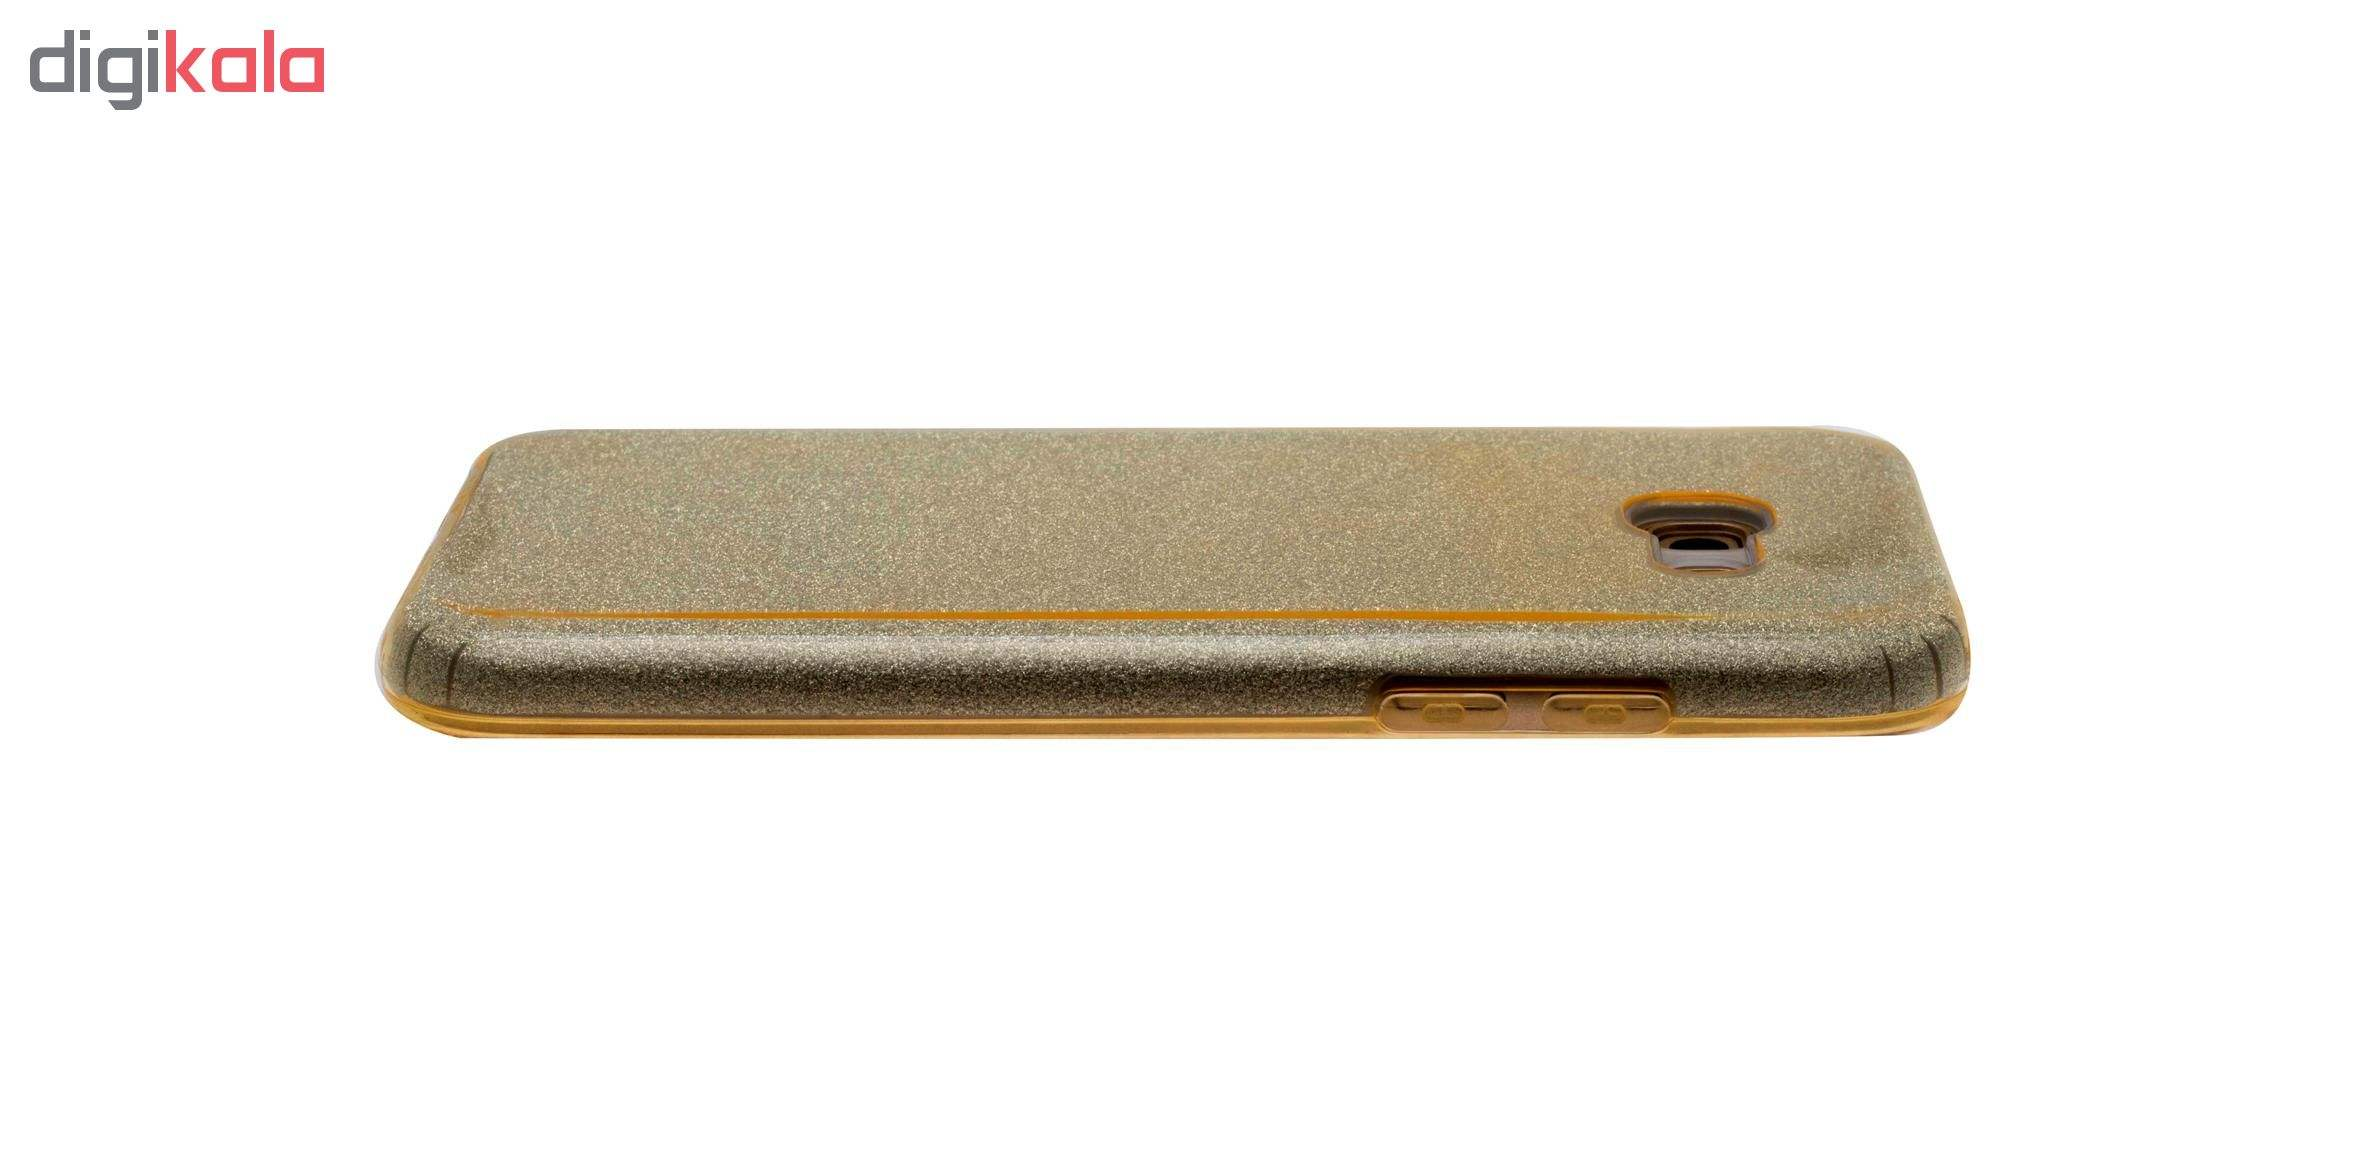 کاور مدل CORONA طرح اکلیلی مناسب برای گوشی سامسونگ گلکسی A5 2017 / A520 main 1 16